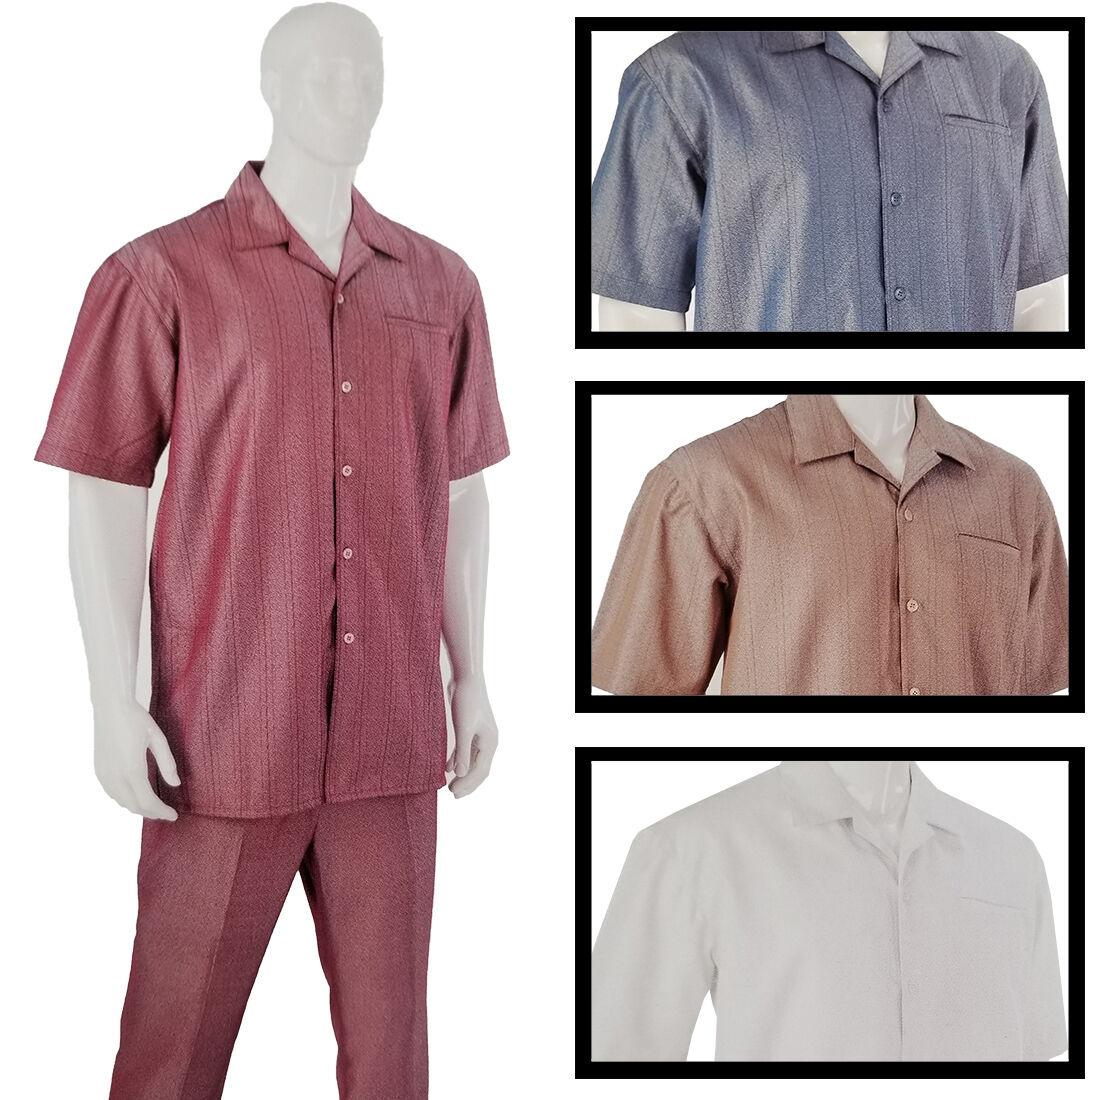 NEW LUXTON SET Uomo 2 PCS SET LUXTON Luxury Linen Casual Design Color Walking 100% POLY 5e972c